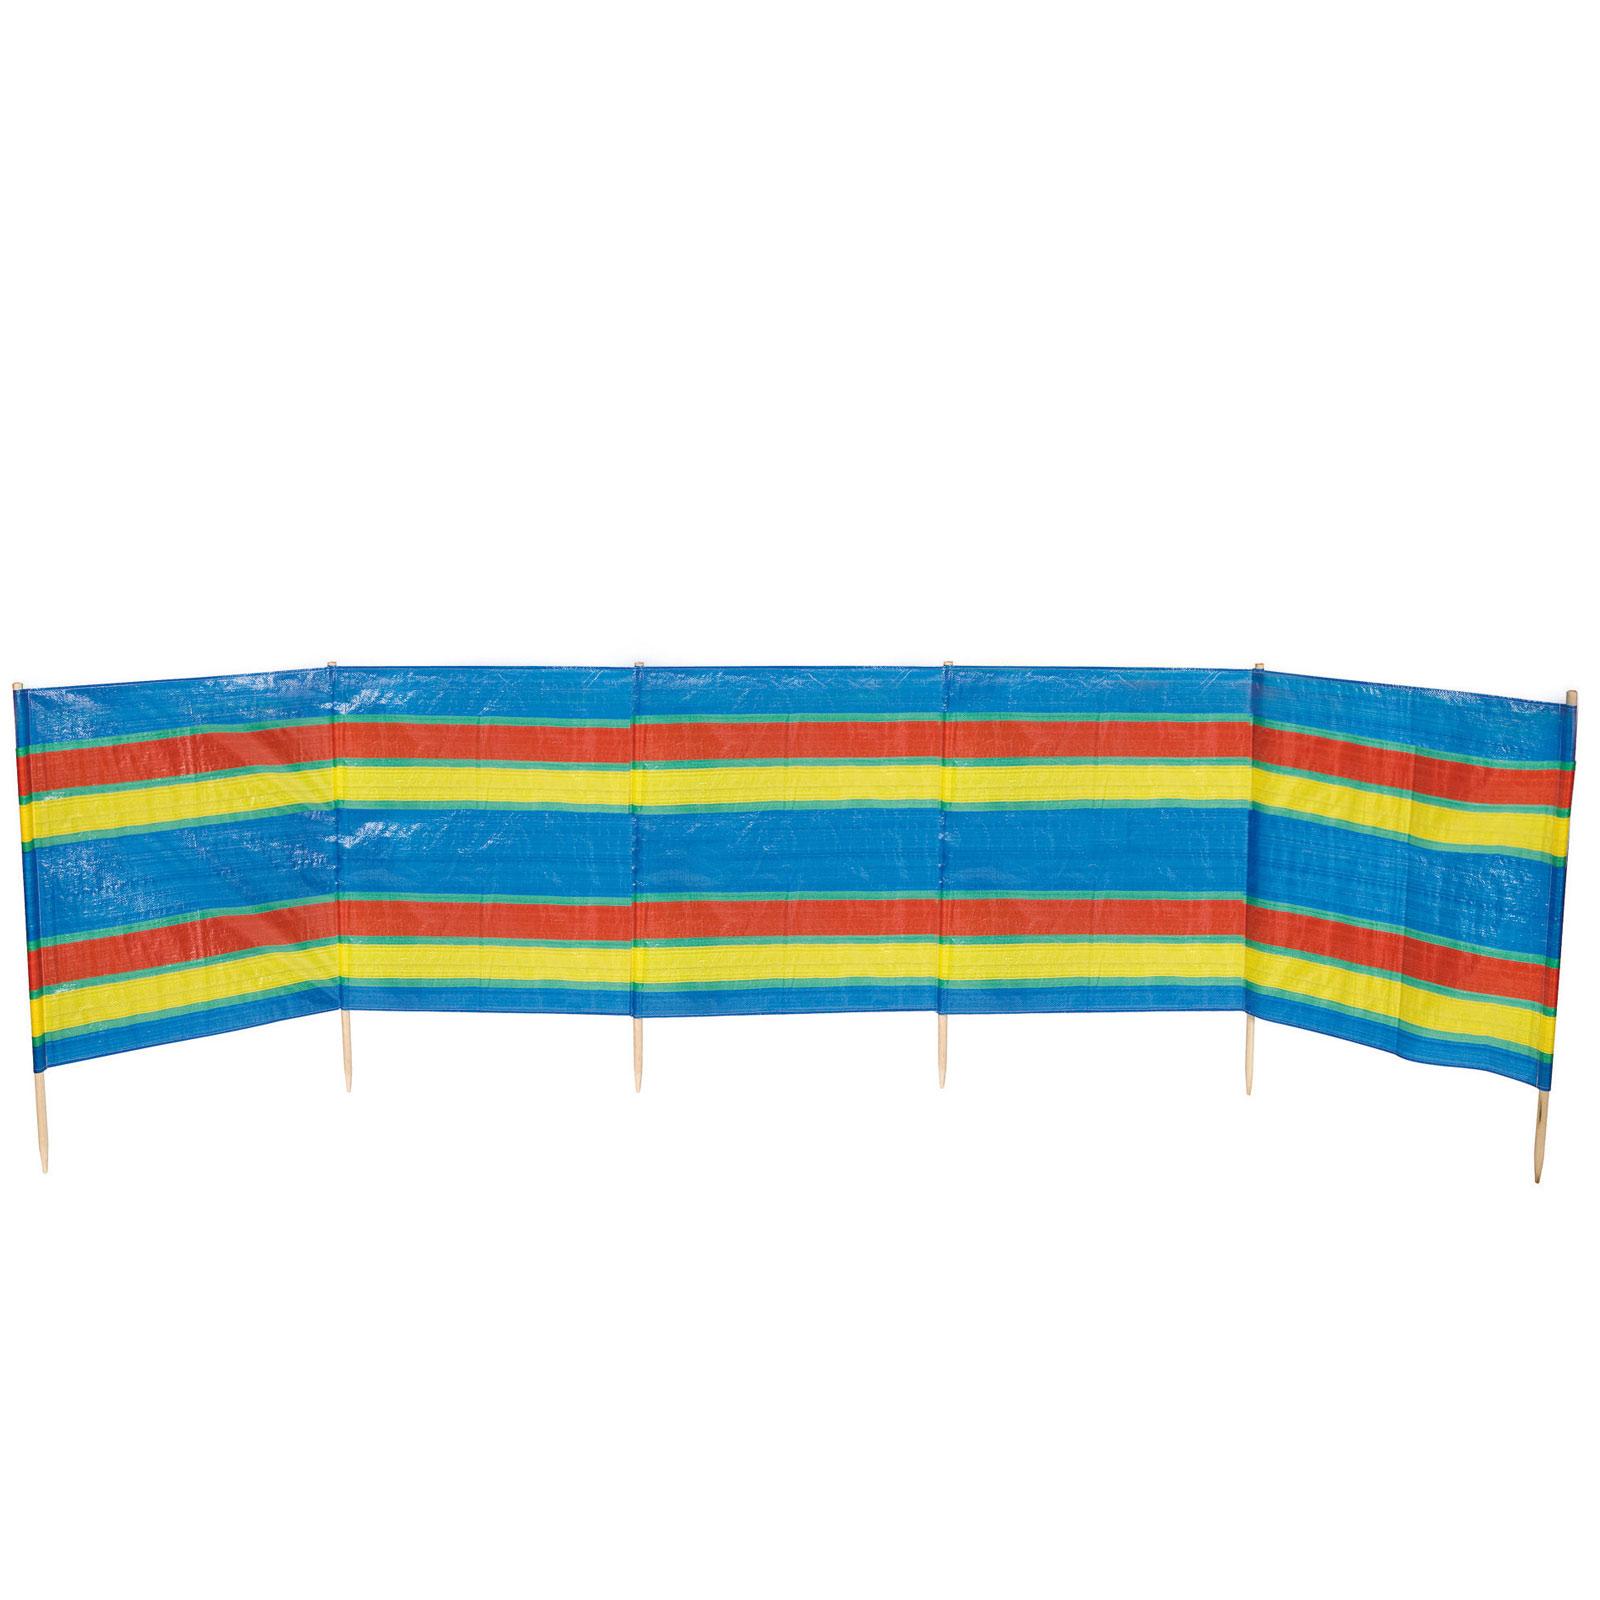 BO CAMP Camping Windschutz XL Strand Zelt Sichtschutz Garten